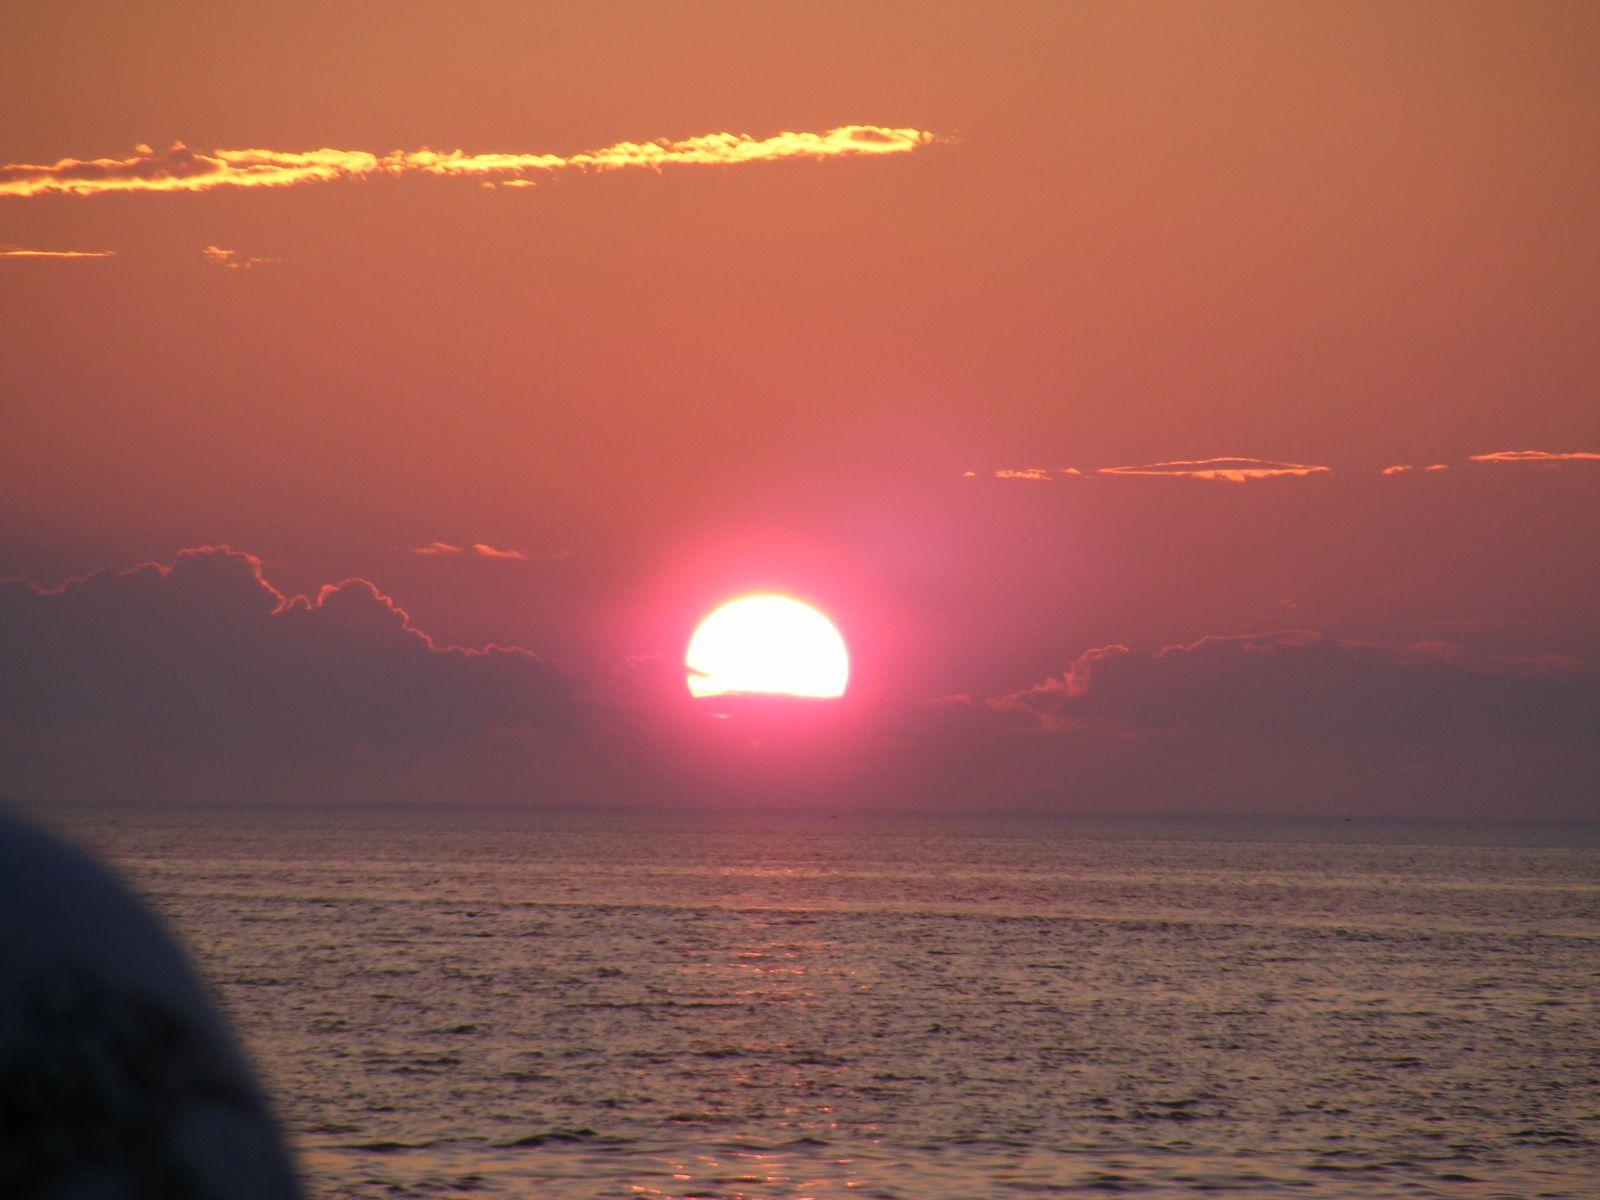 Beautiful Sunset Taken Off Sesuit Harbor Dennis Ma Taken From The Albatross Fishing Boat Fishing Boats Beautiful Sunset Sunset